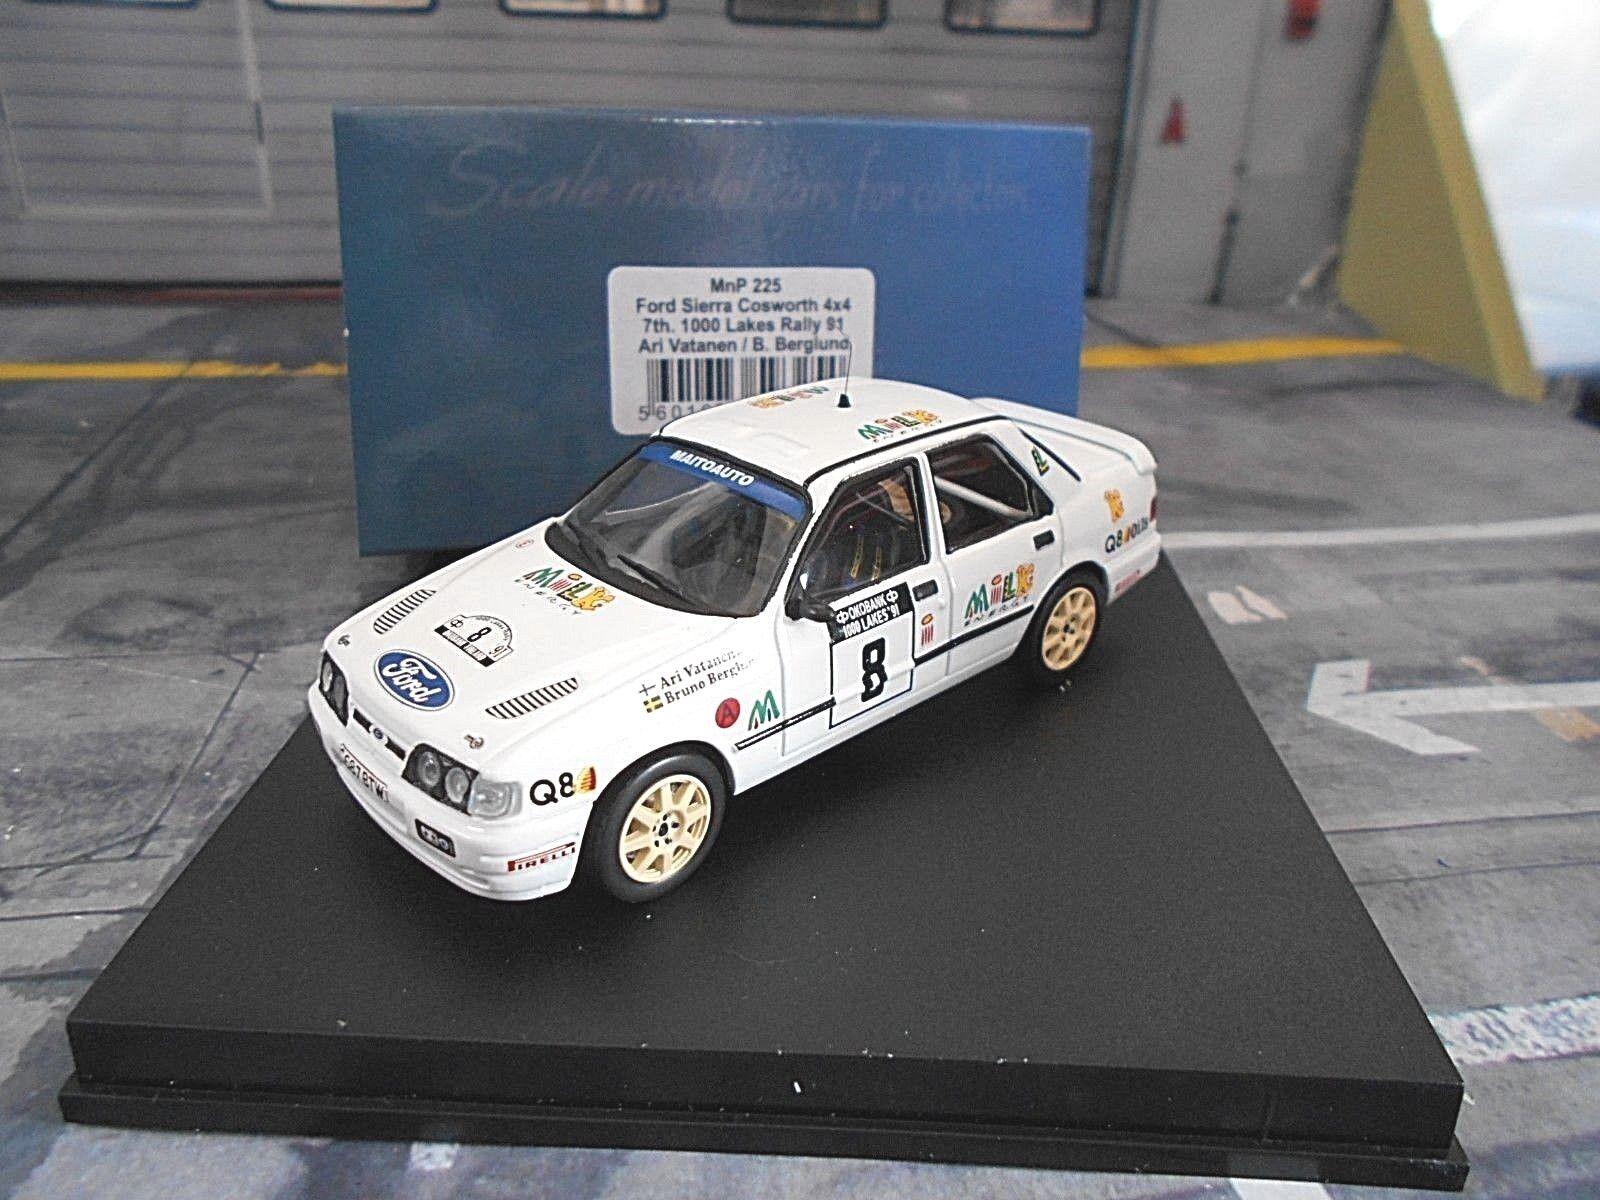 Ford Sierra Cosworth 4x4 1000 Lakes Rallye Finlande  8 VATANEN 1991 Trofeu 1 43